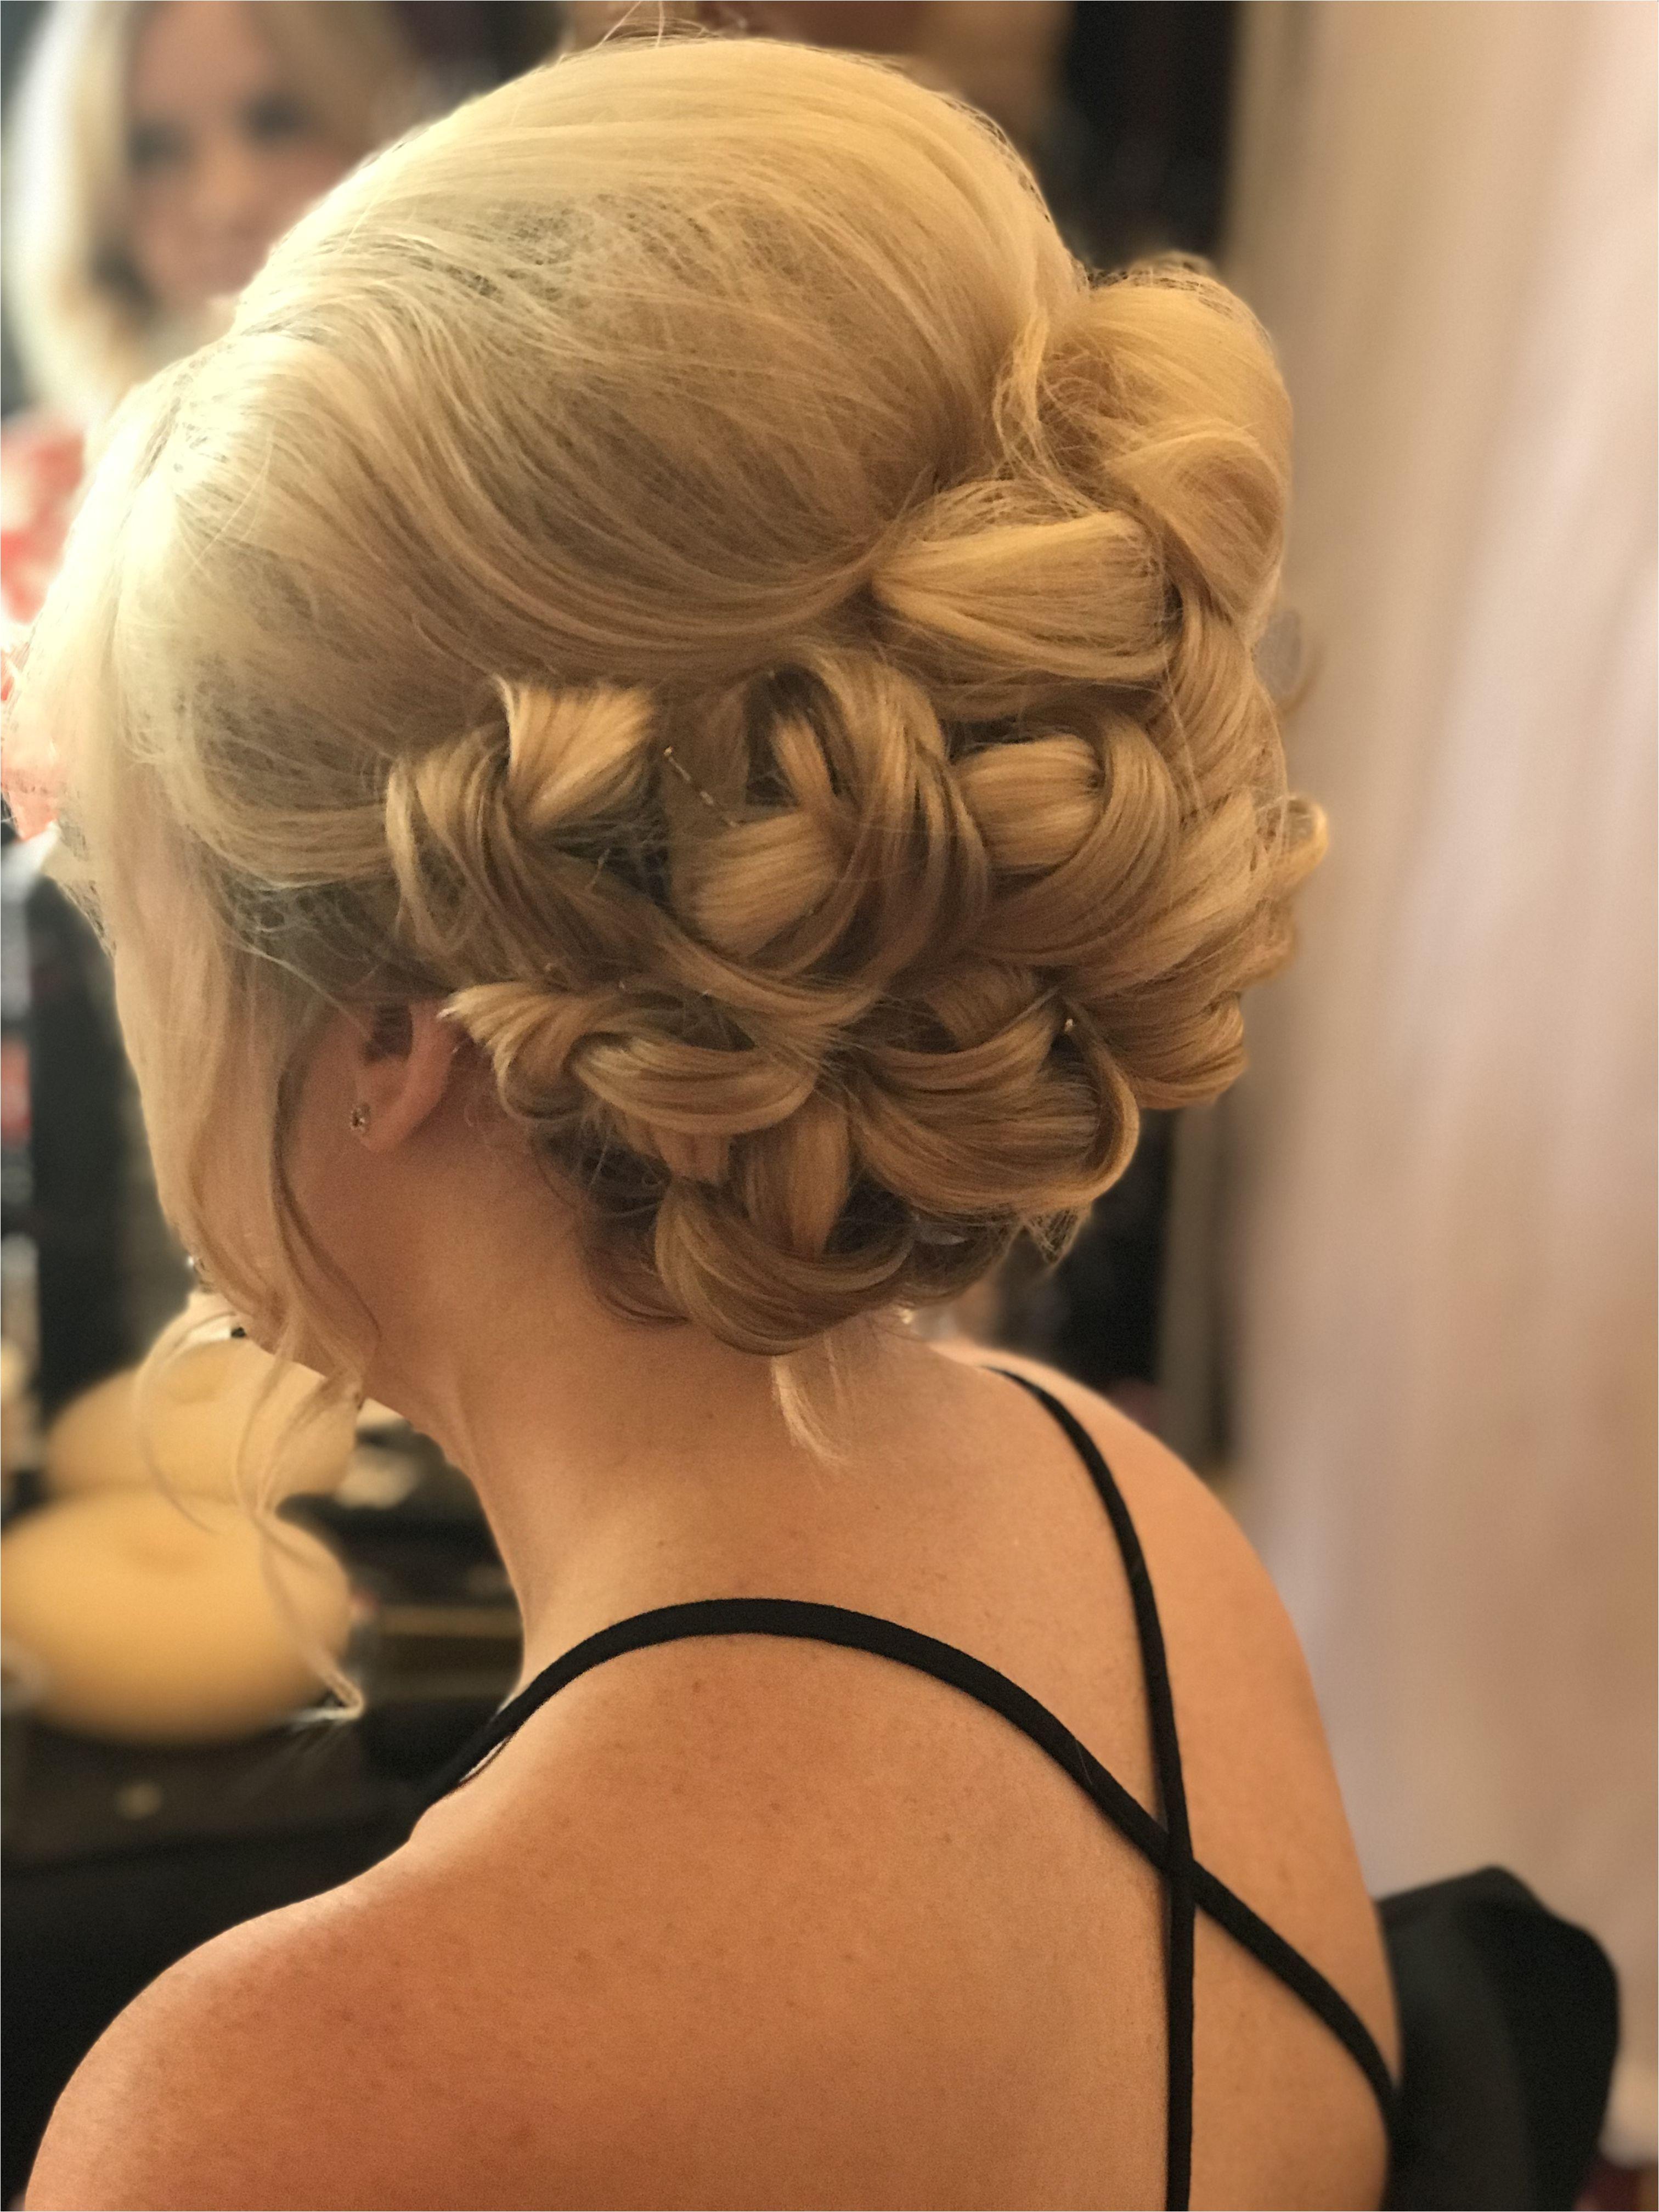 Party Hairstyles Bridal Hairstyles Hair Buns Big Hair Updos Hairdos